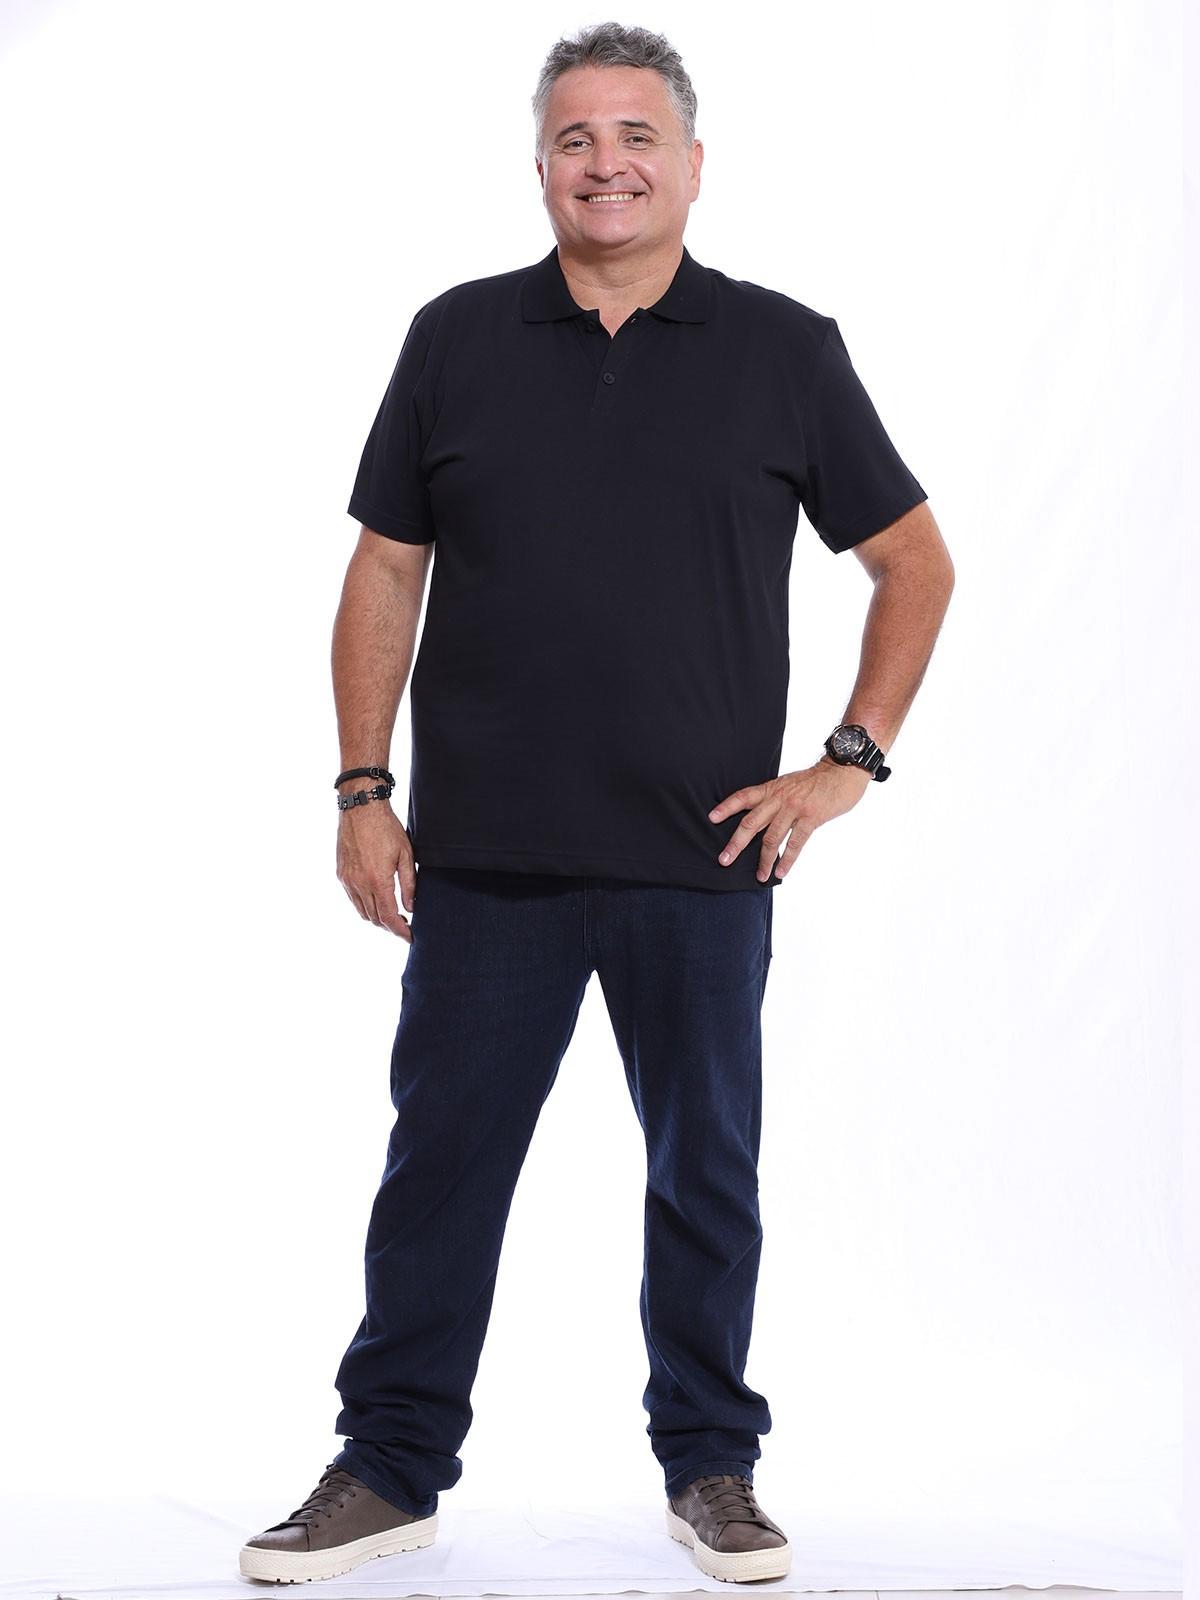 Camisa Polo Plus Size Masculina Lisa Básica Algodão Preta